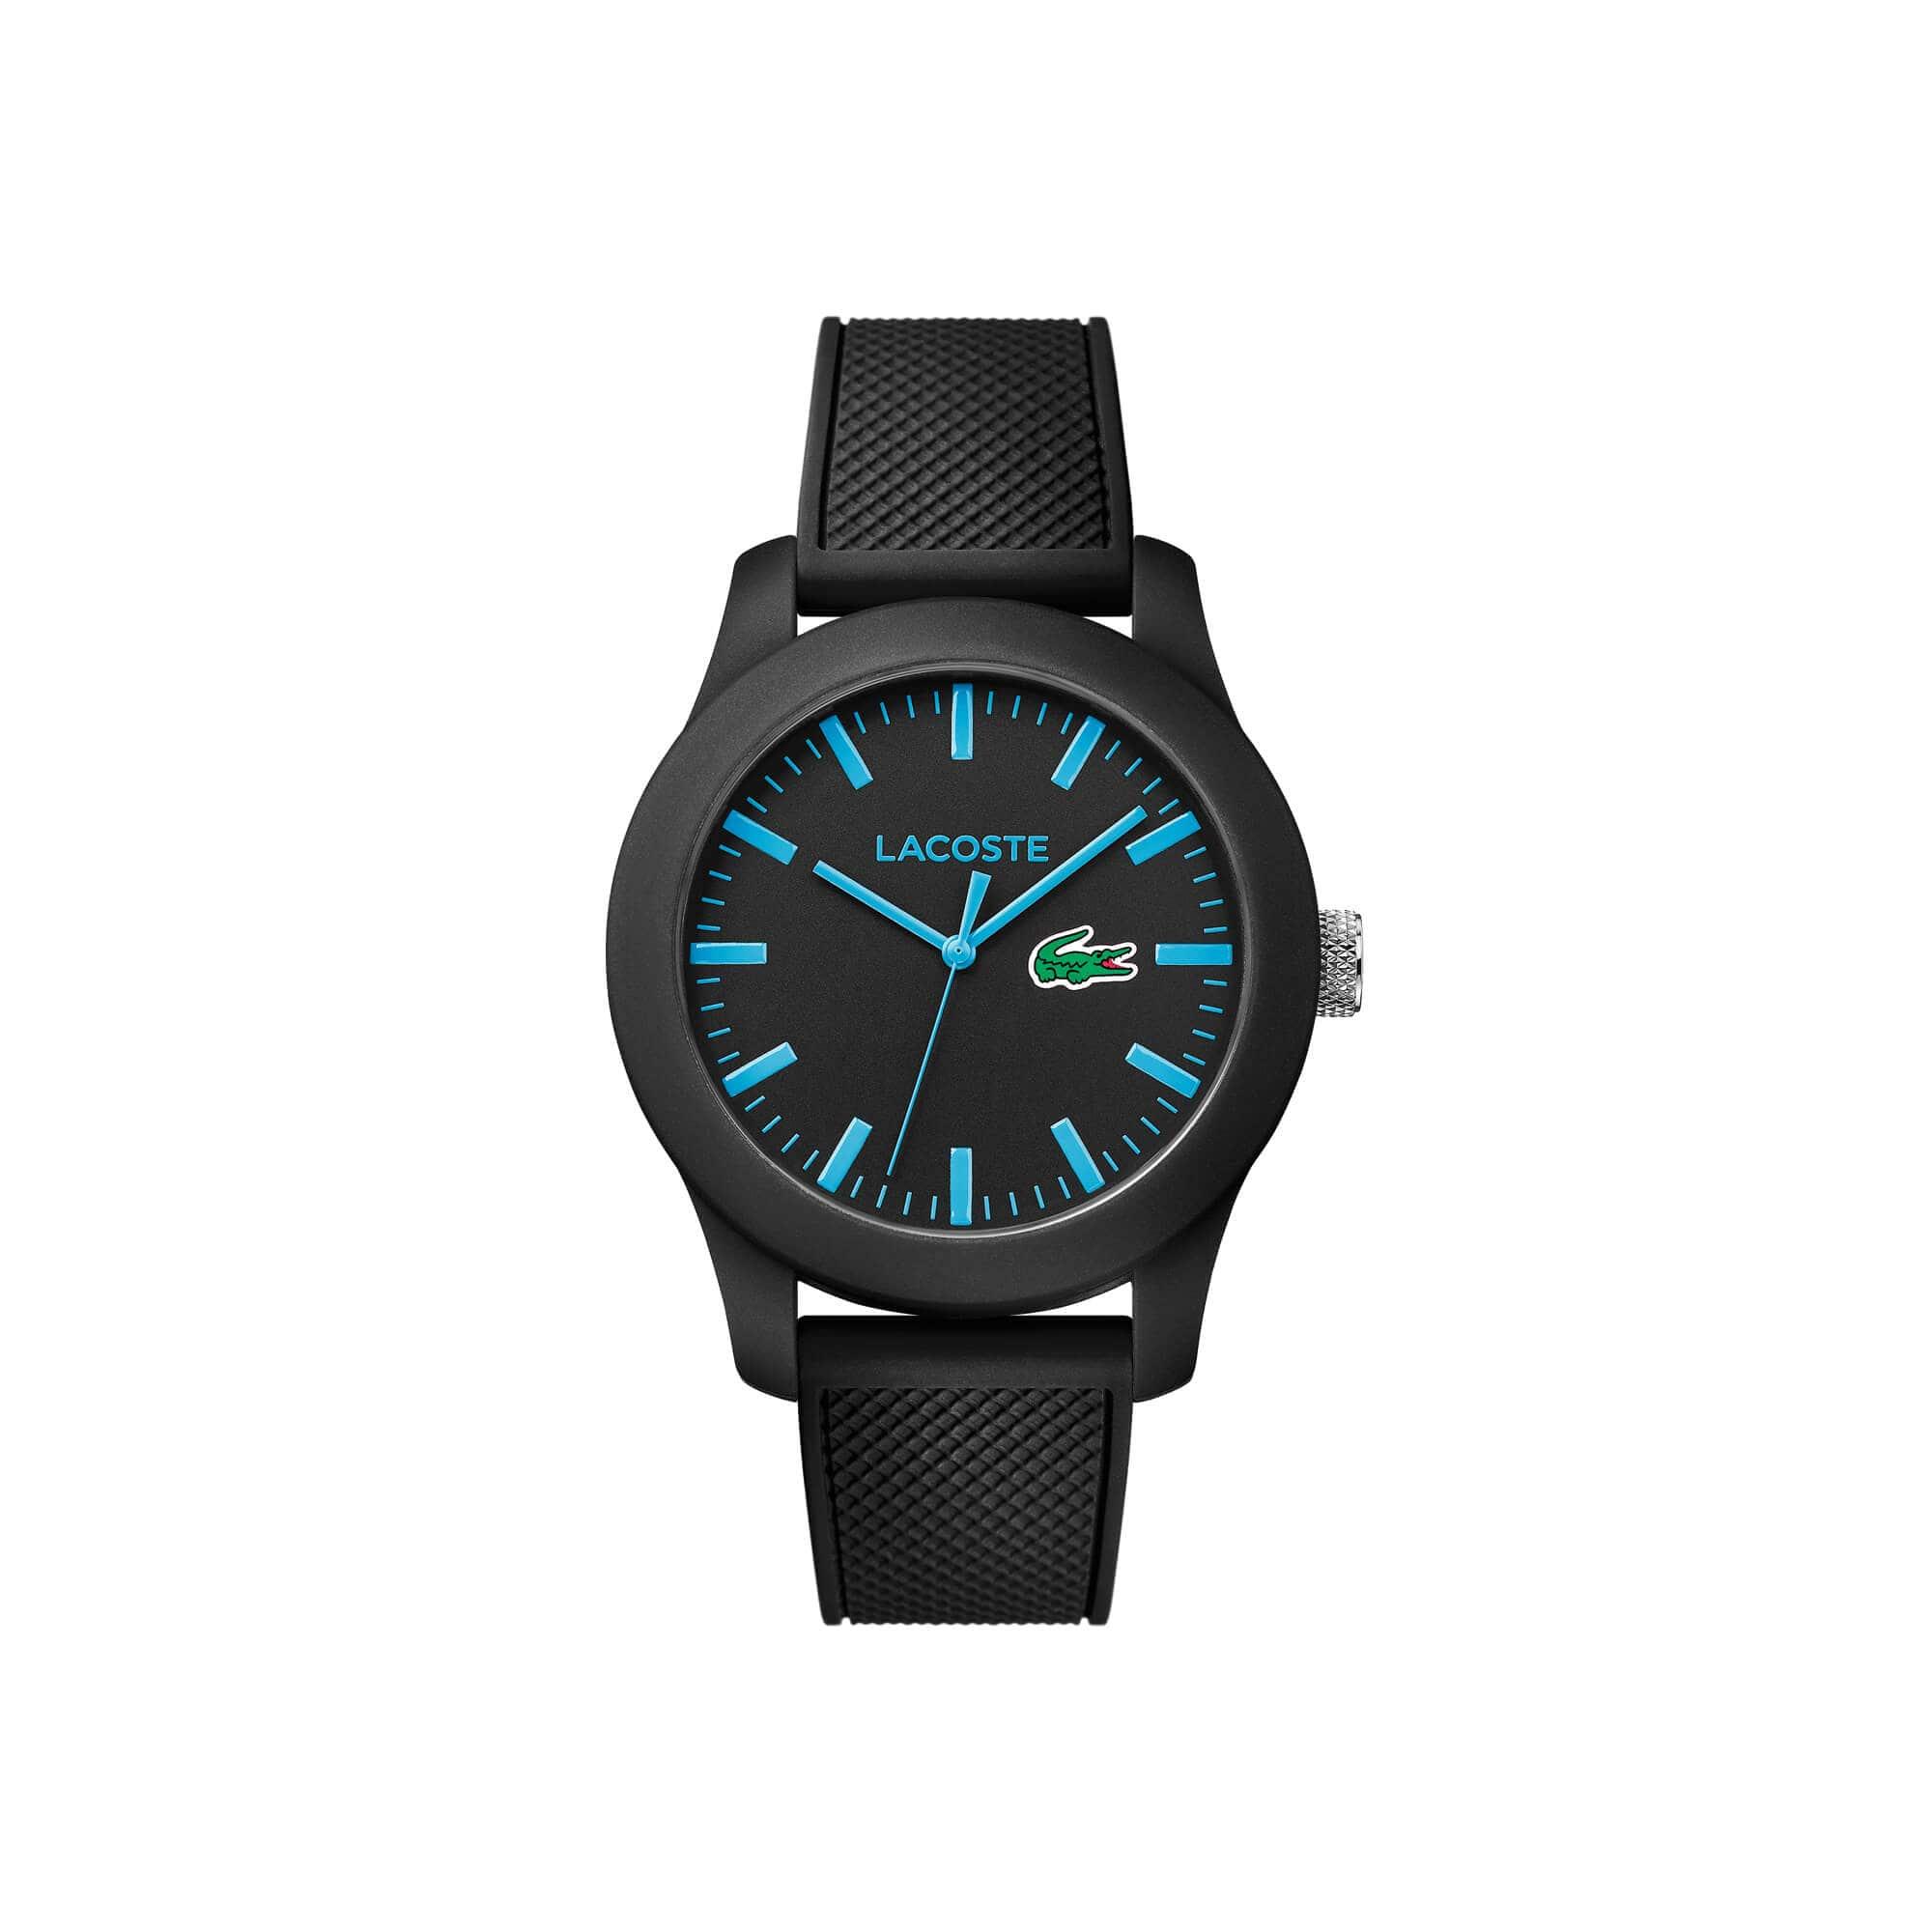 Relógio Lacoste 12.12 com pulseira de silicone